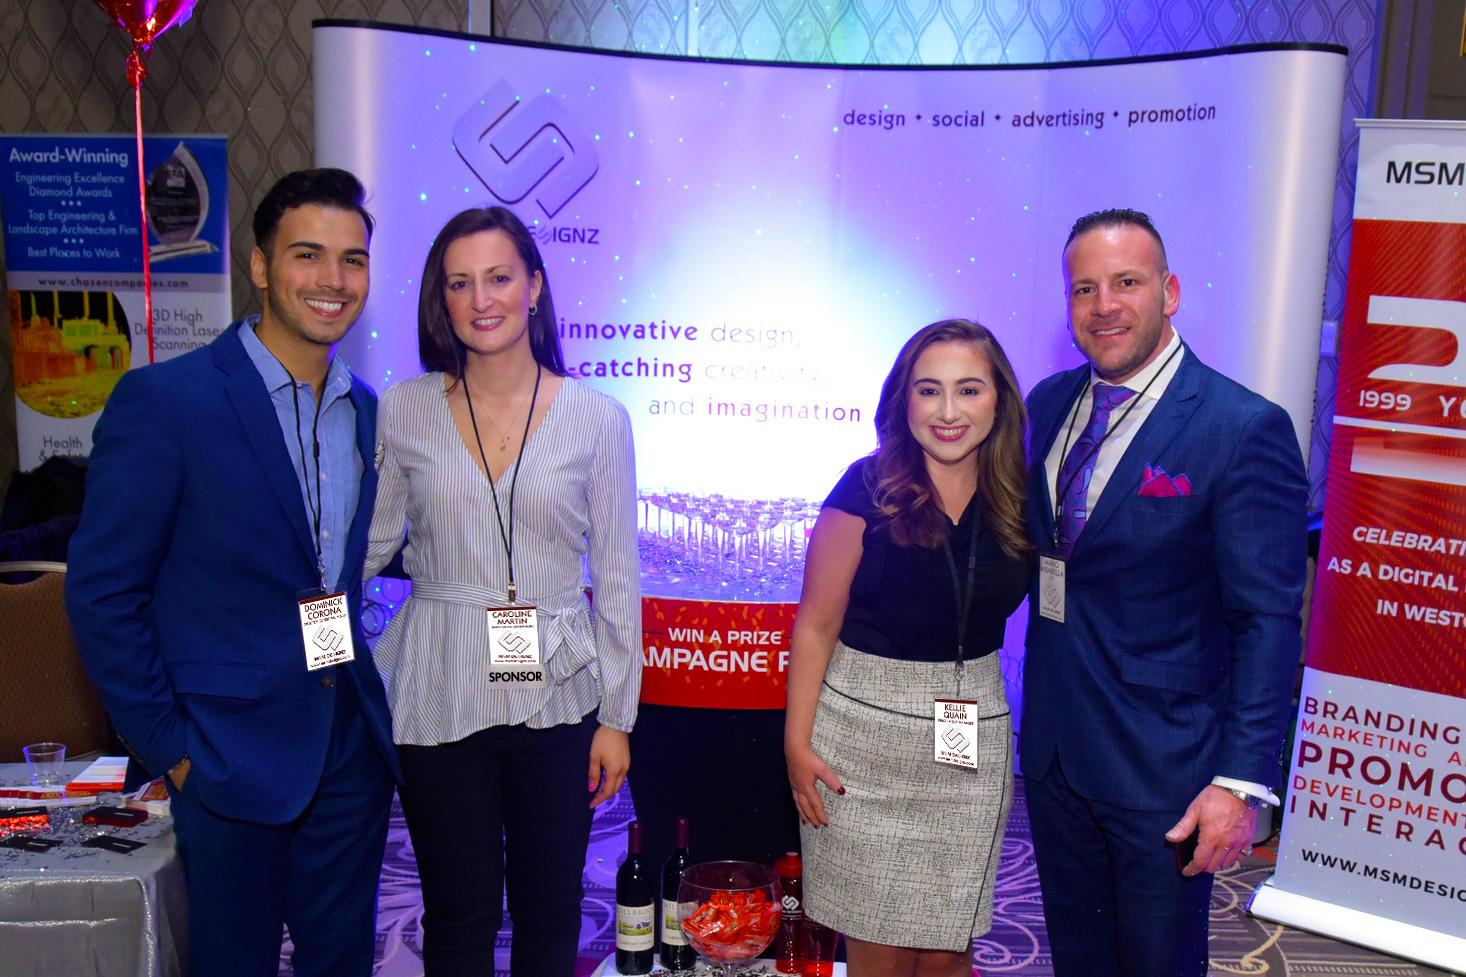 MSM Team: Dominick Corona, Caroline Martin, Kellie Quain and CEO Mario Mirabella